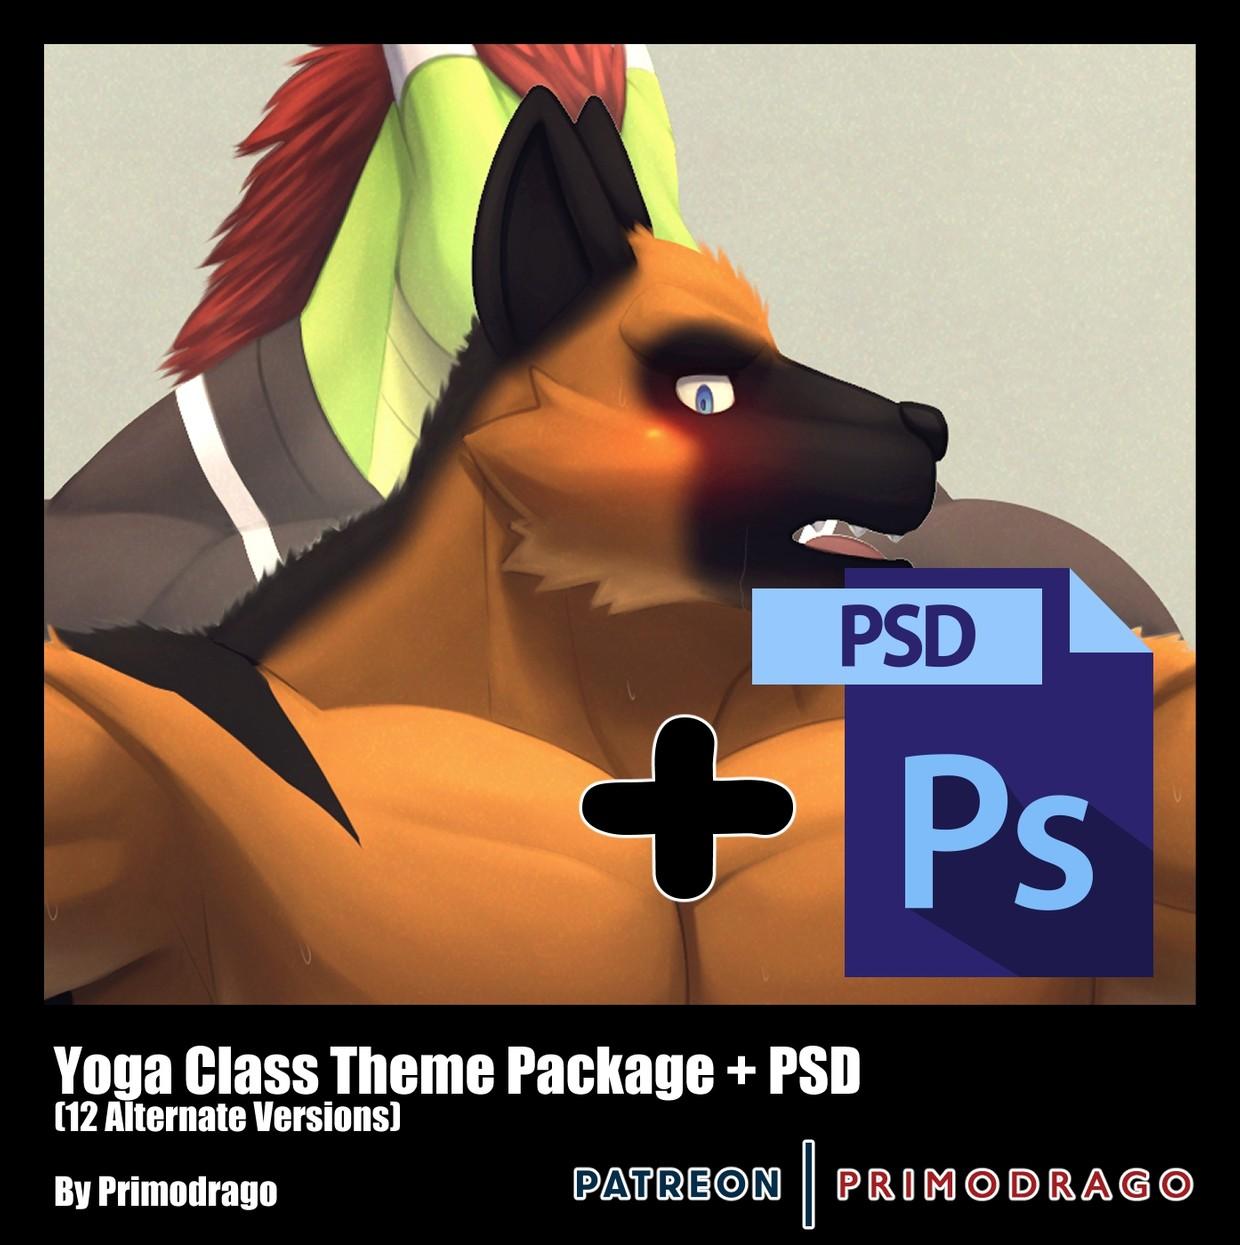 Yoga Class + PSD File